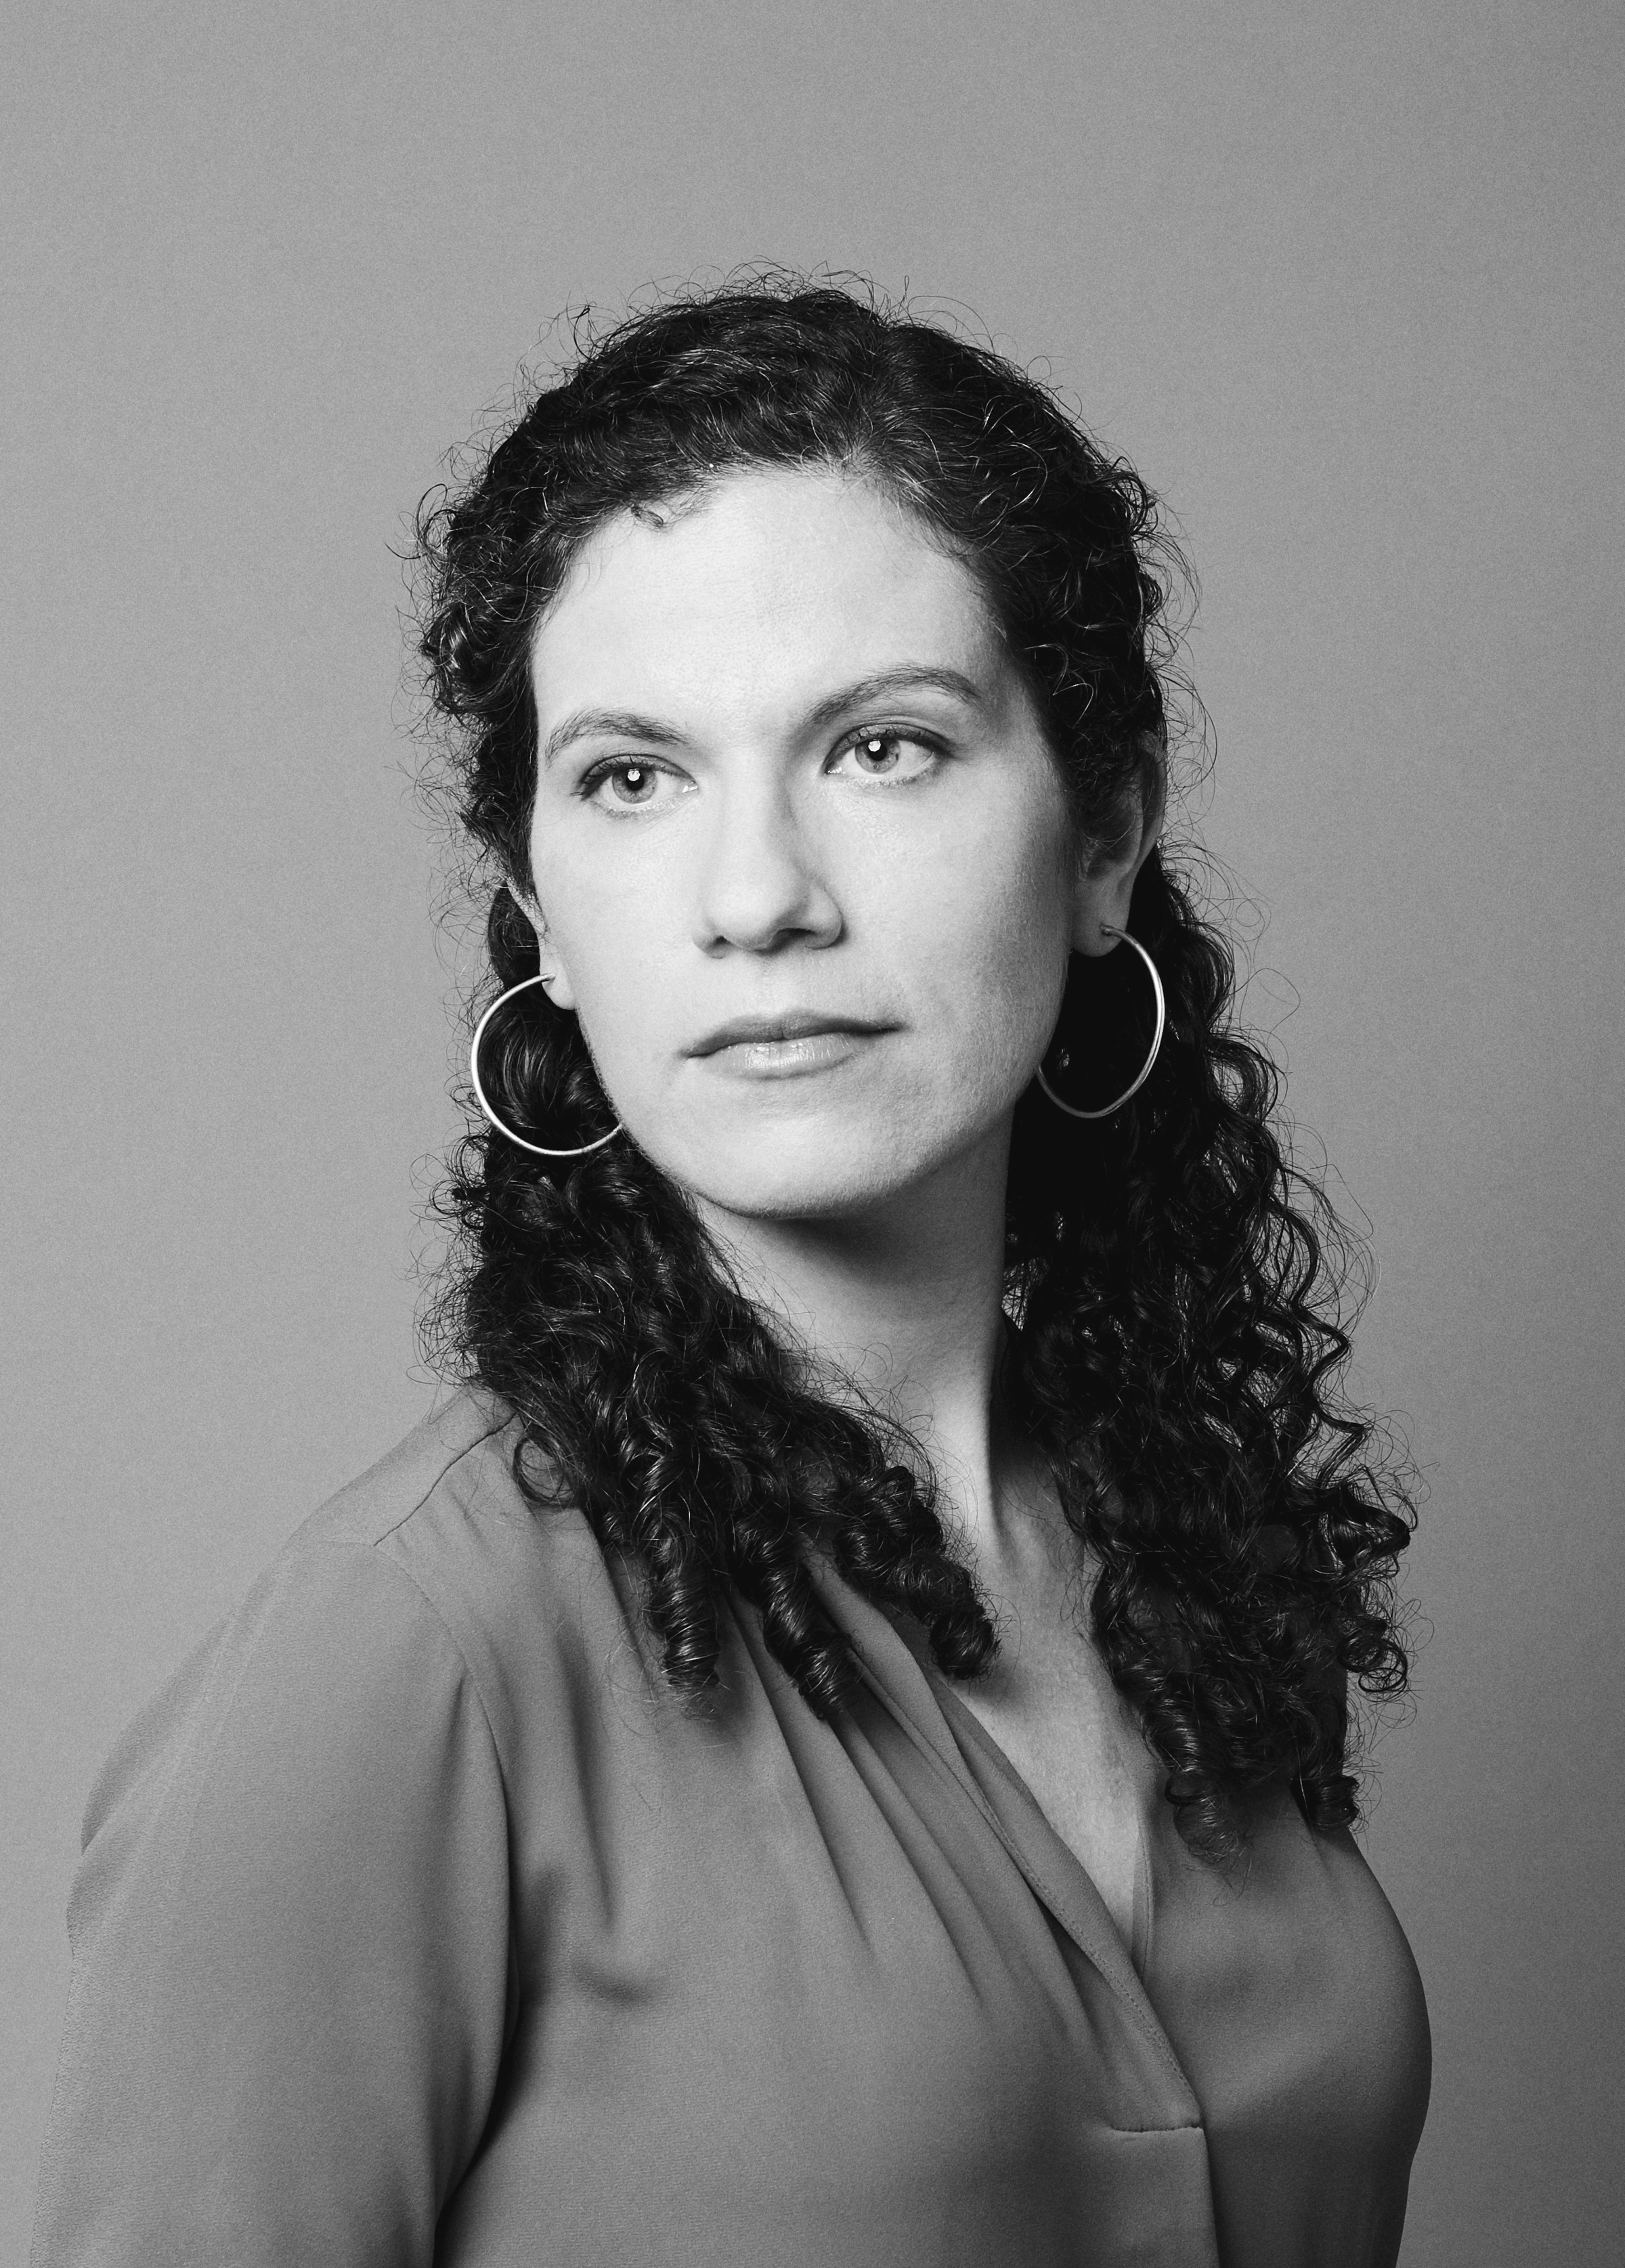 Maria McFarland Sánchez-Moreno